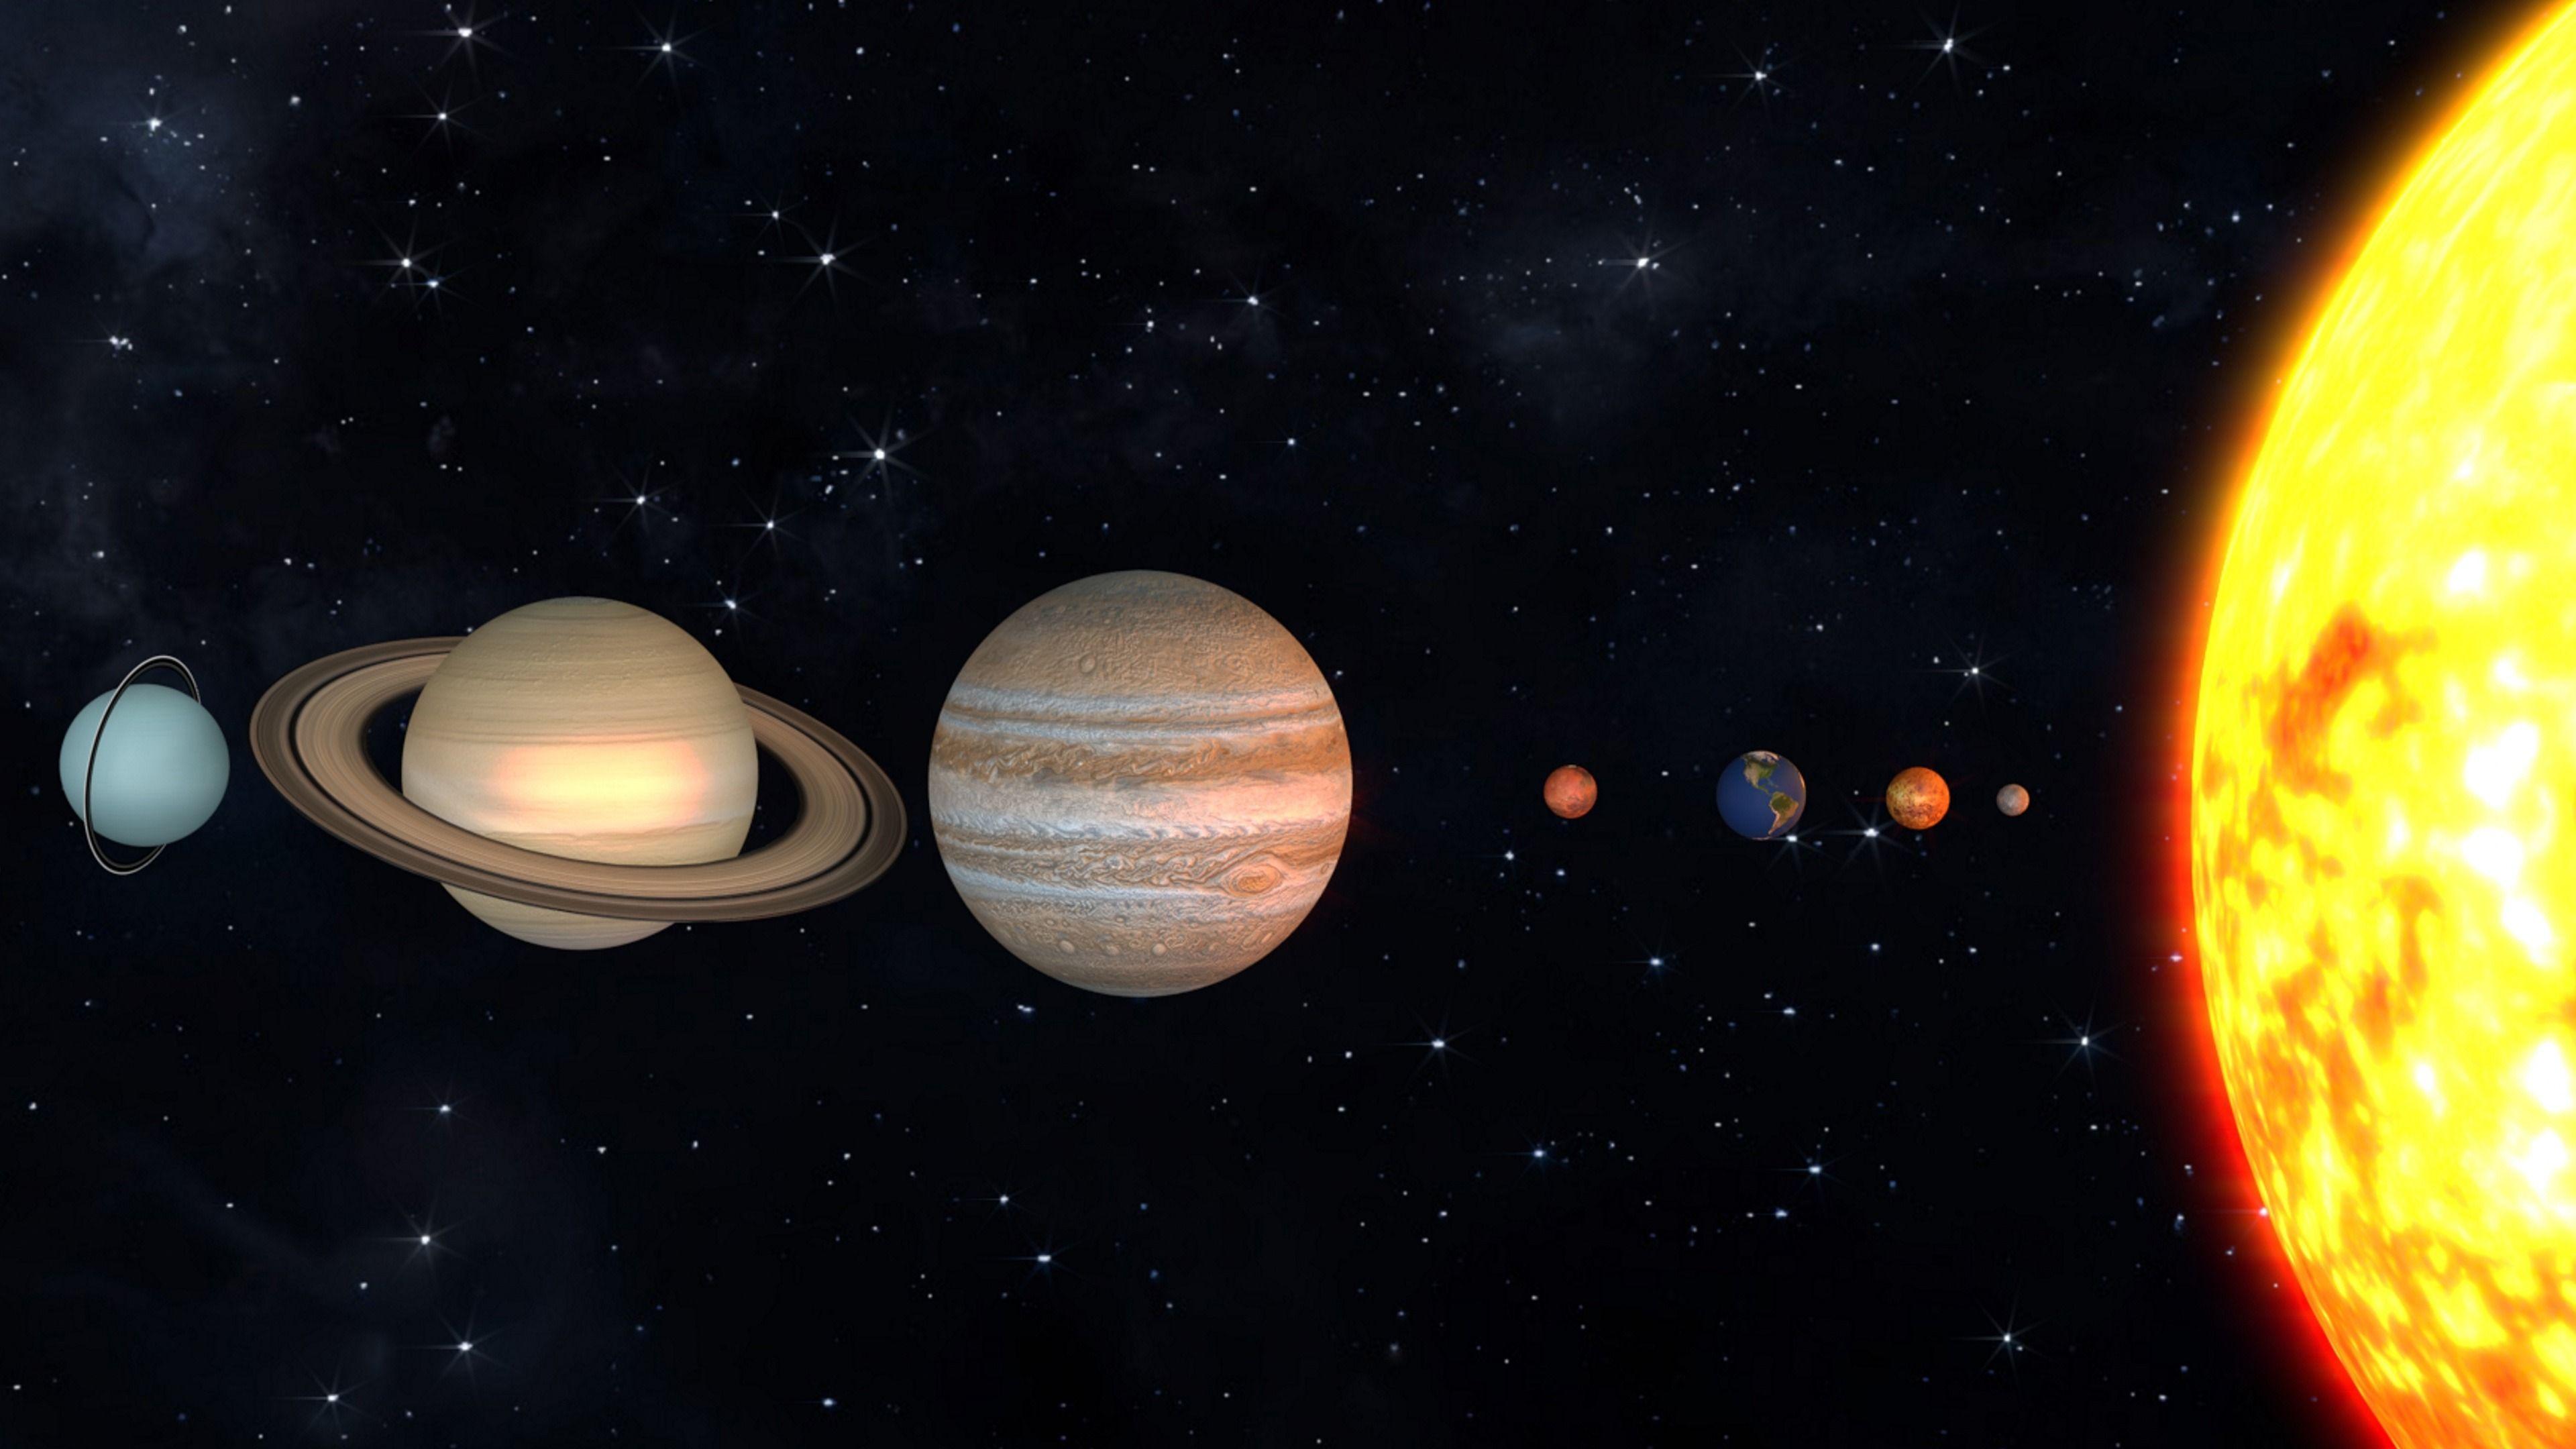 Cosmic Galaxy 4k Background for Desktop